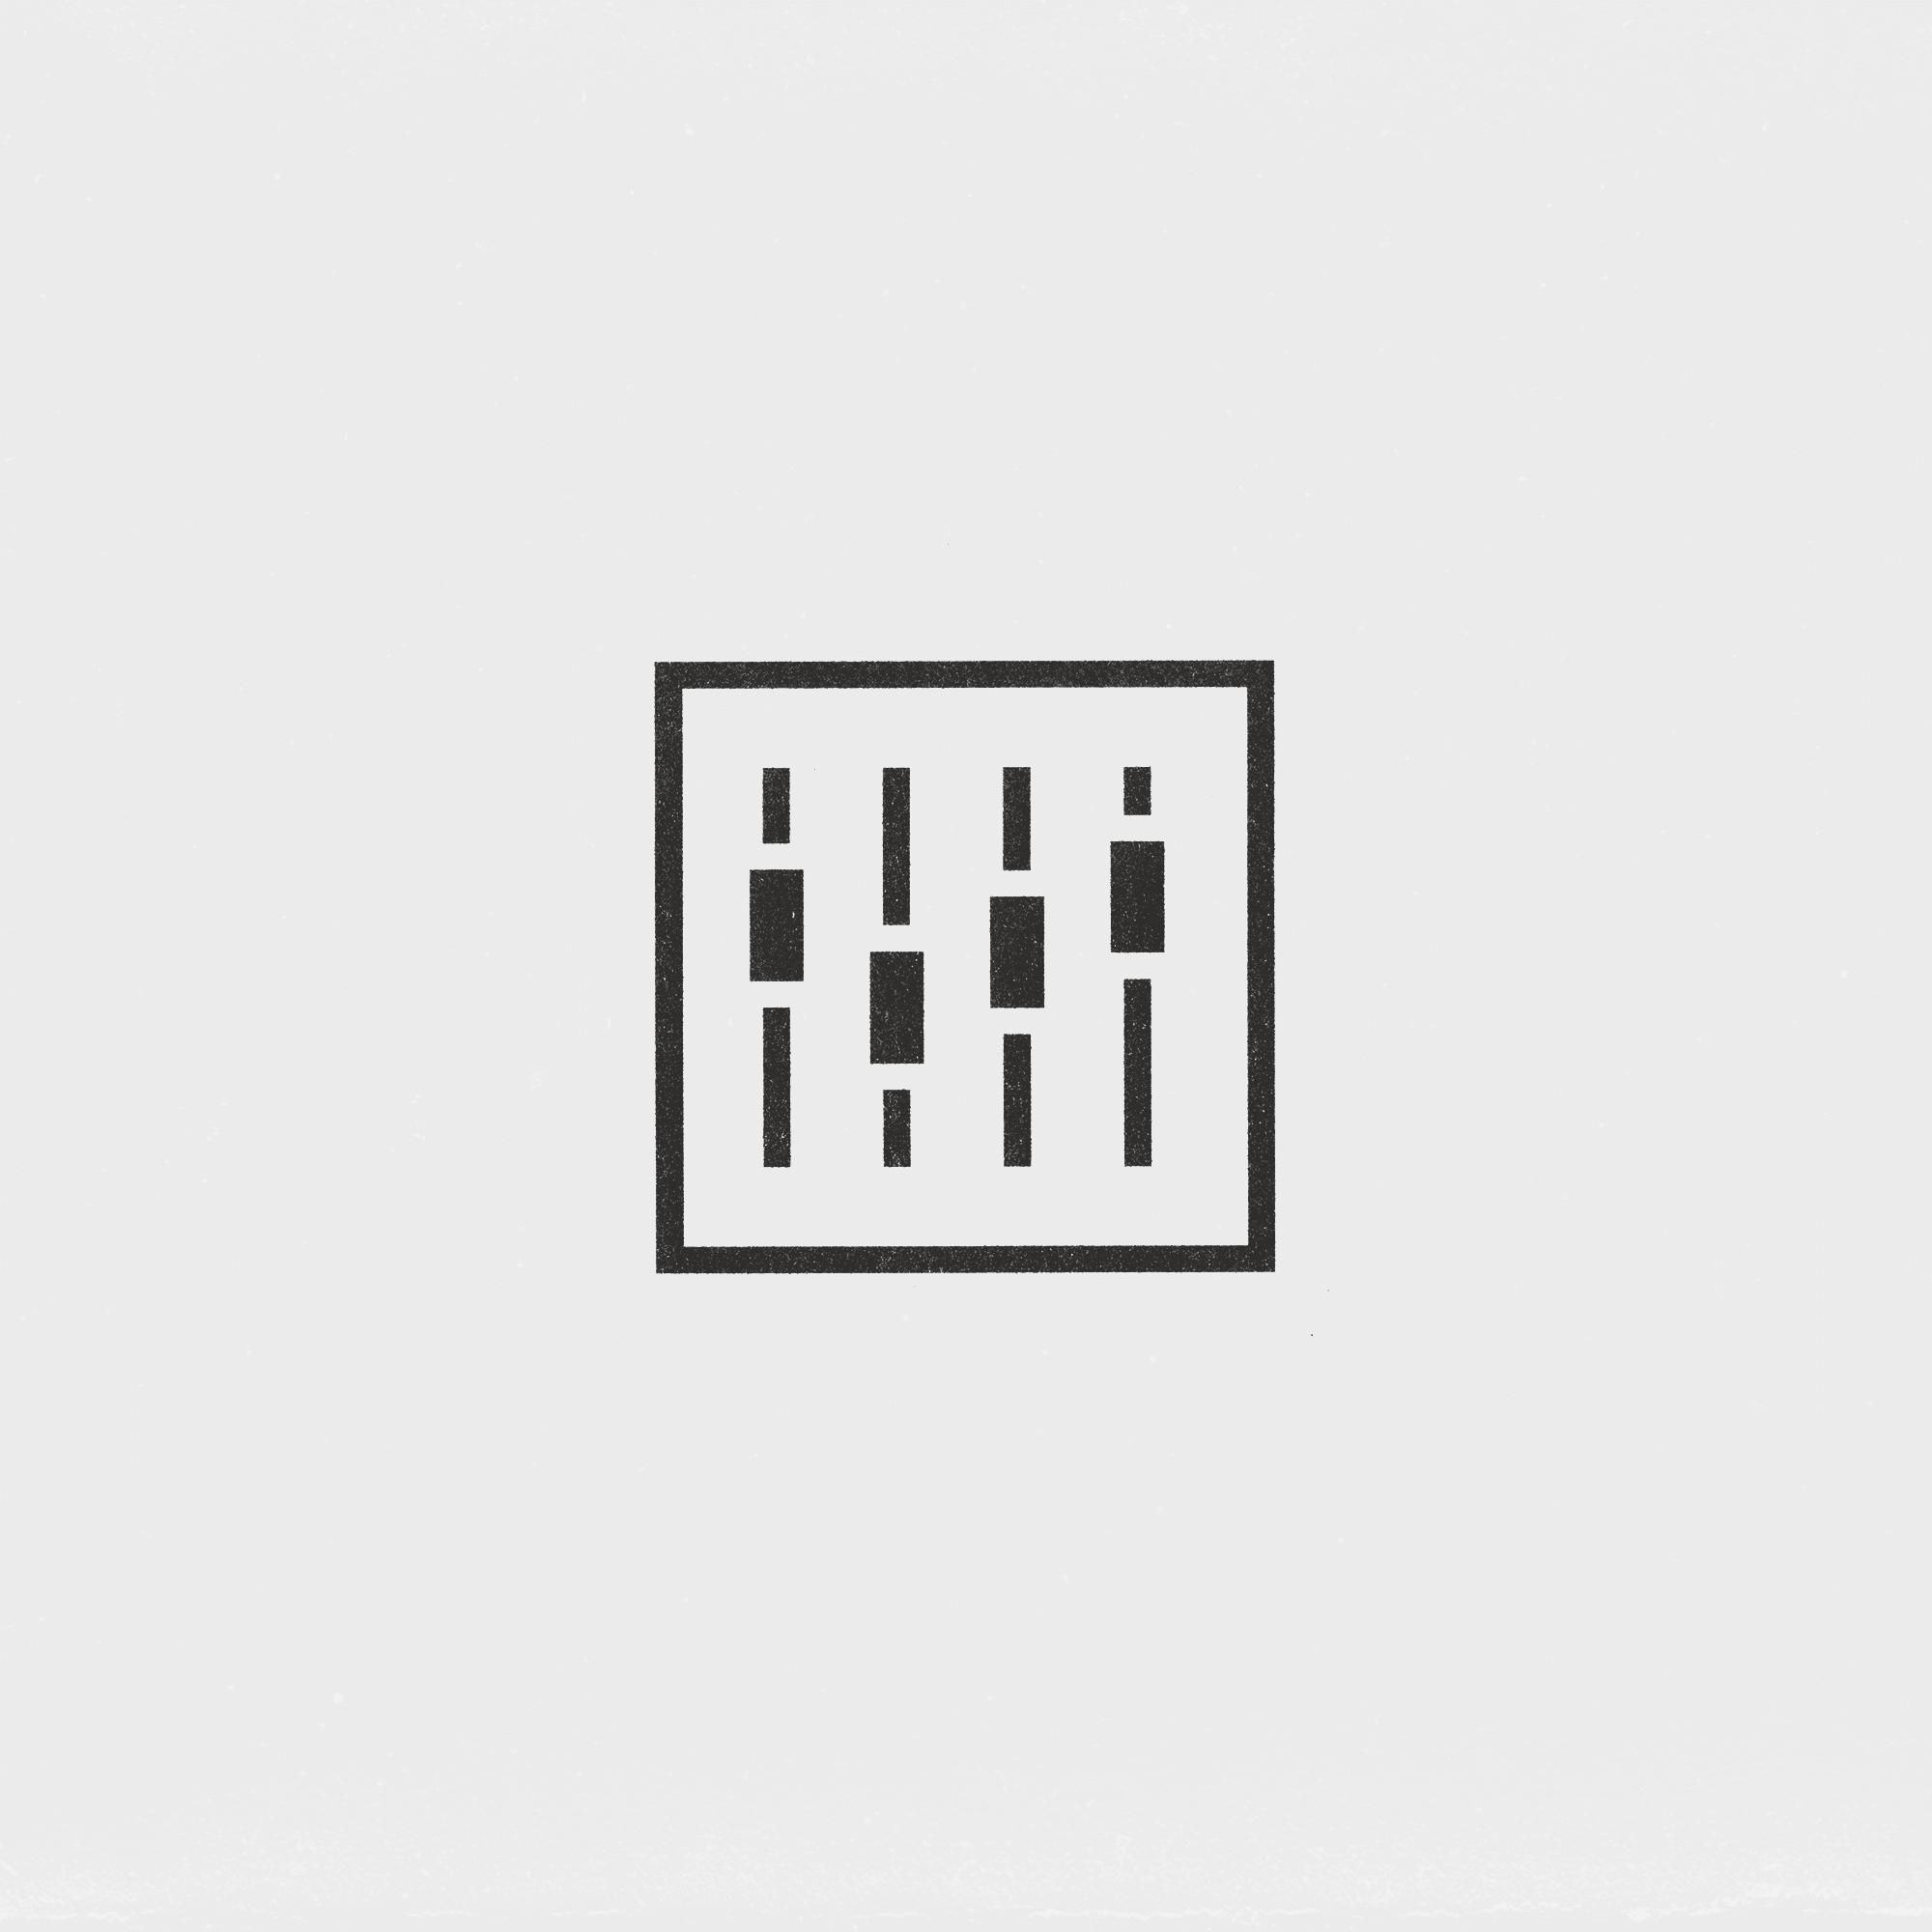 Superkolor_Work_Music_And_Print_Rentour